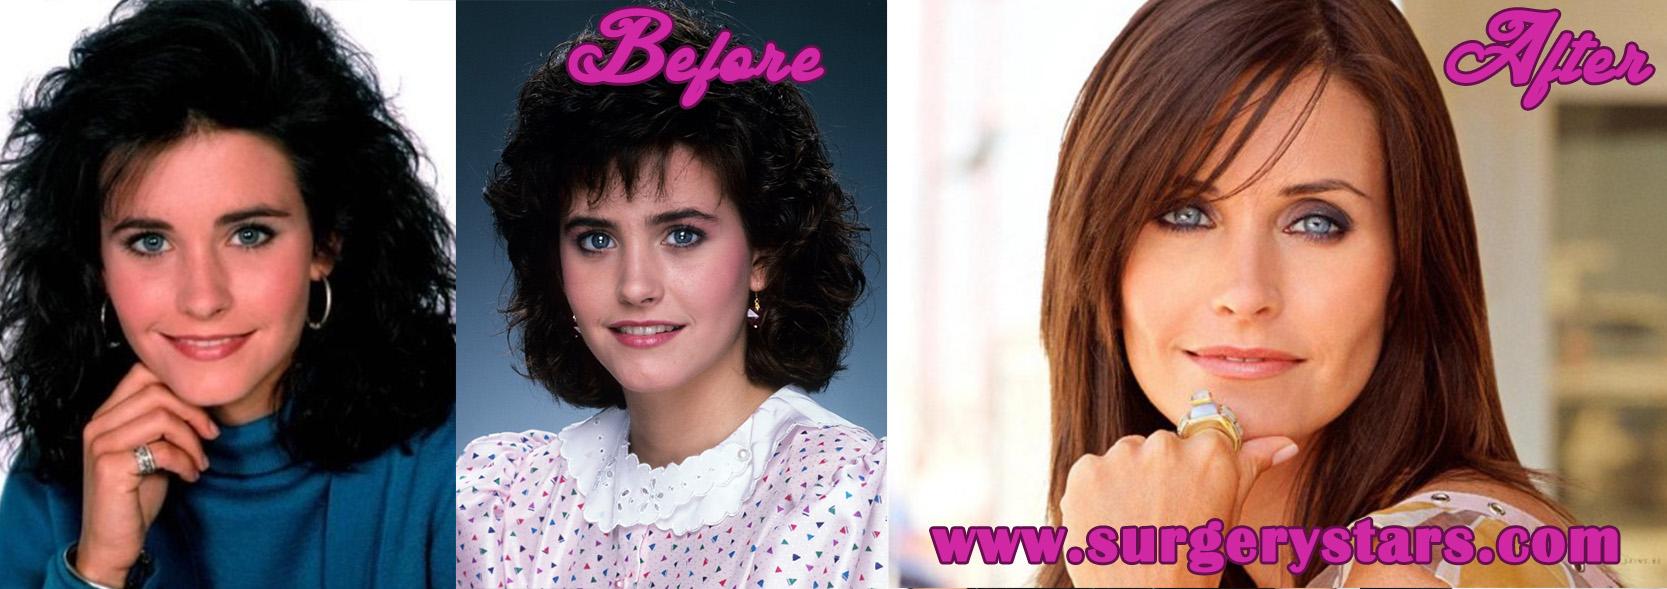 Jennifer Westfeldt Plastic Surgery Before and After Pics